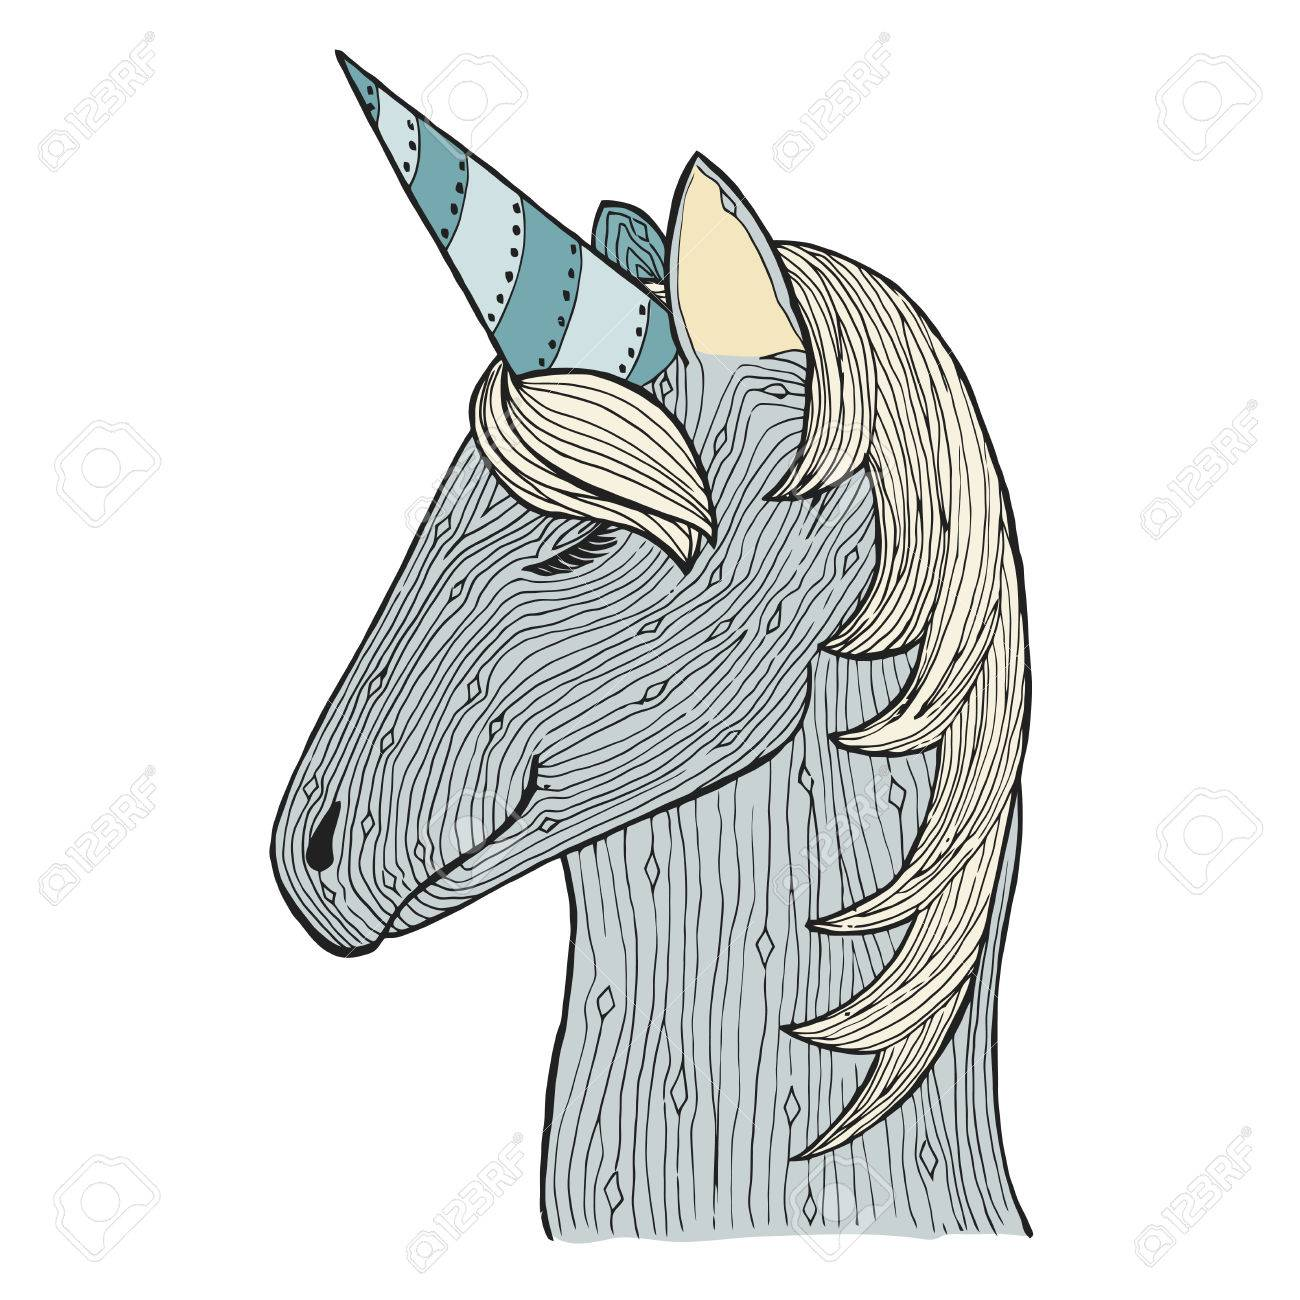 Zen Enredos Y Doodle Unicornio. Semental De Zentangle. Zendoodle ...